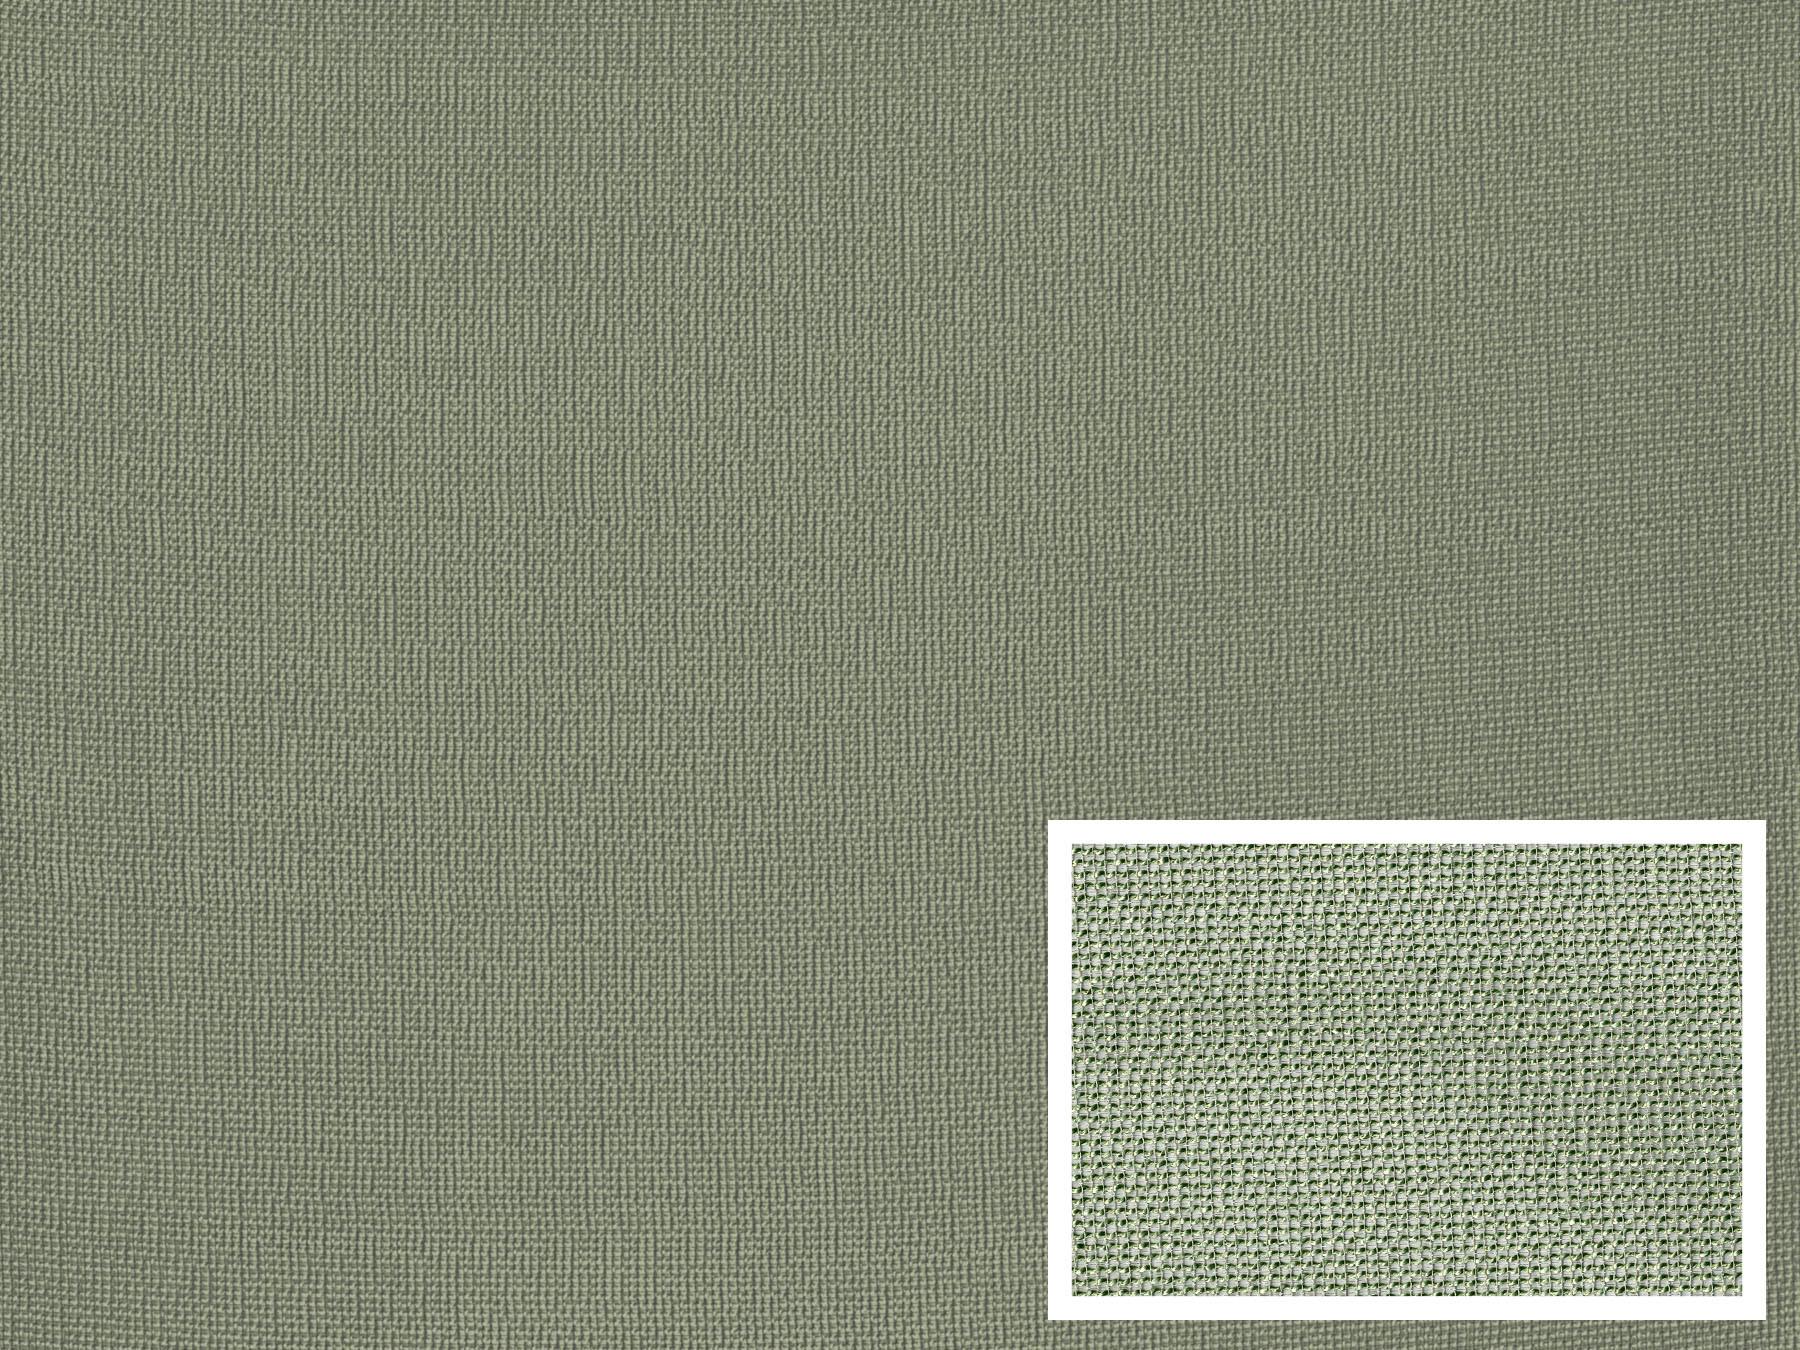 2556_73-2